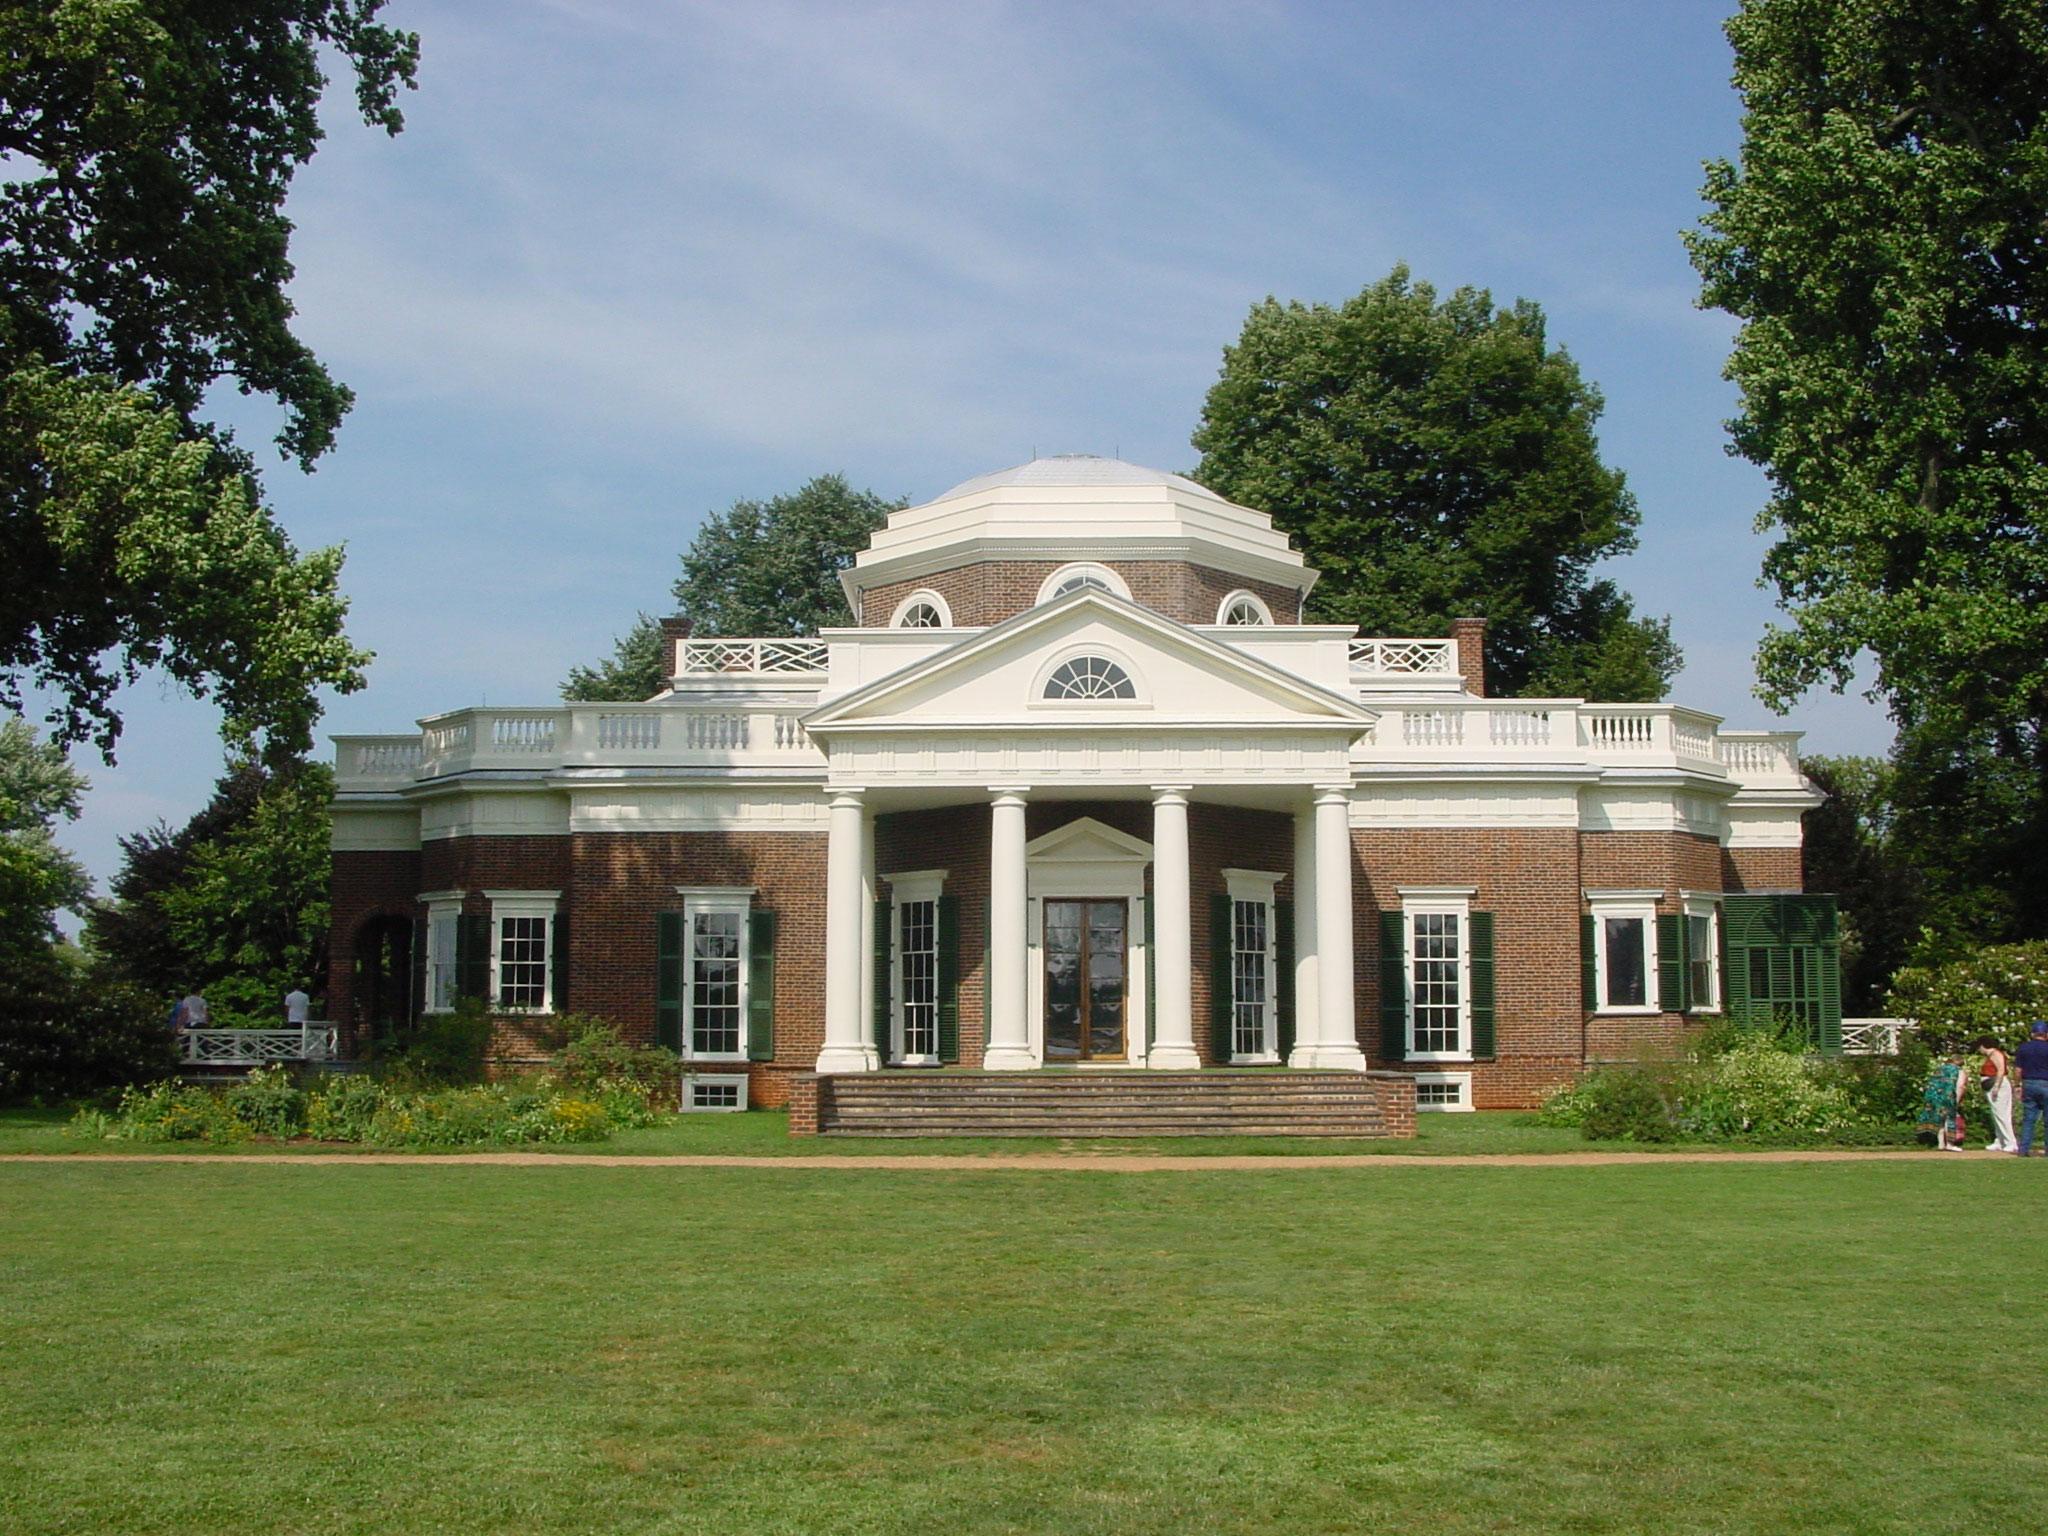 Photo of Jefferson's Monticello, Jefferson Nickel